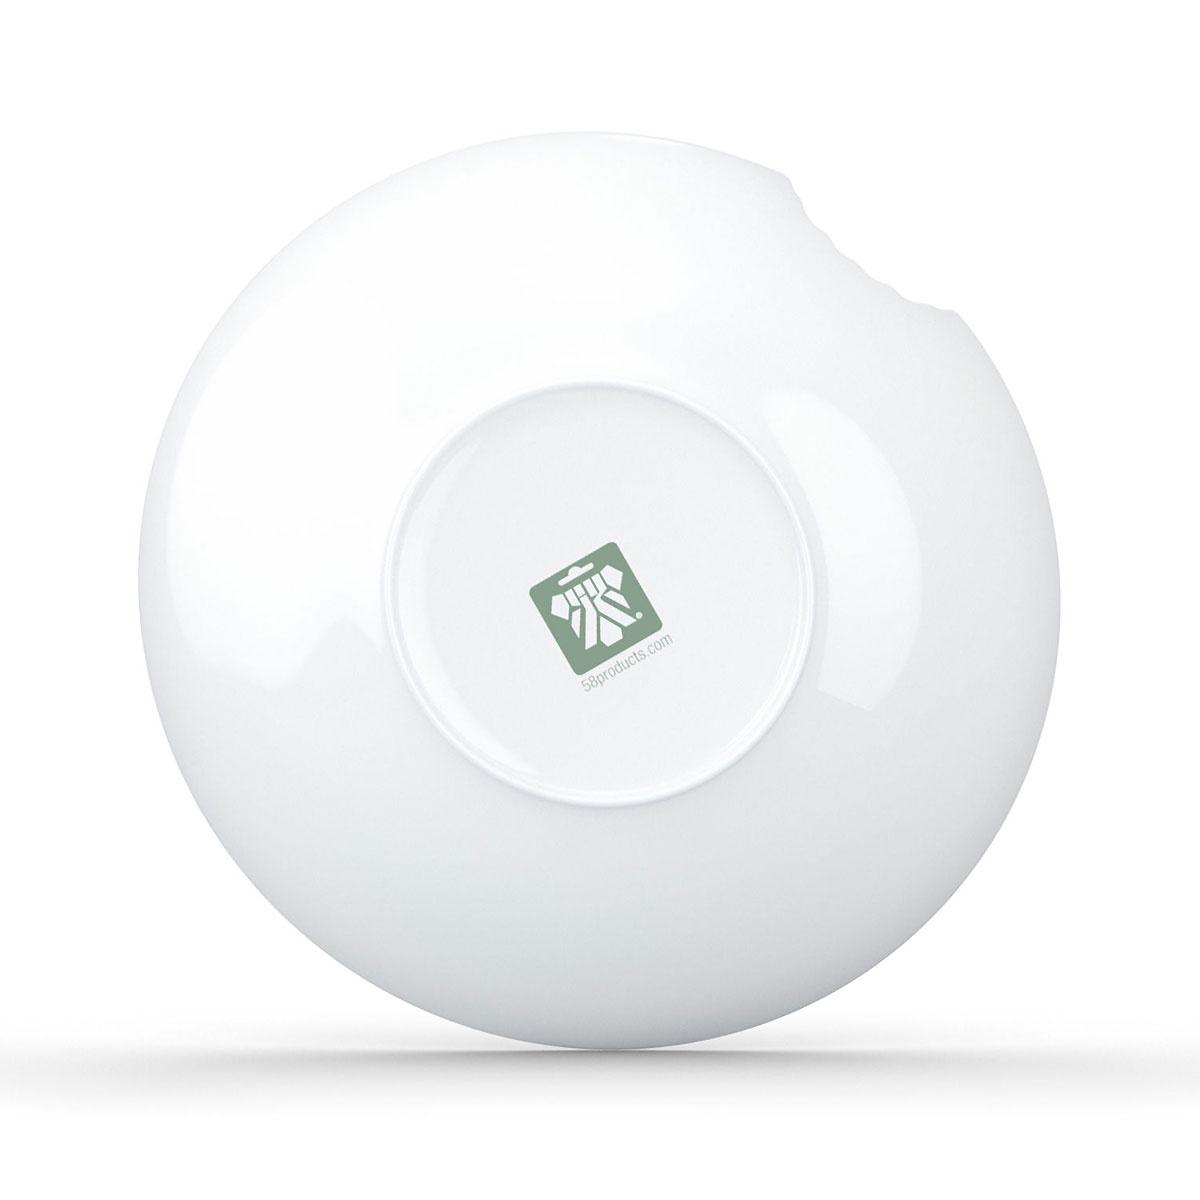 Тарелка глубокая Tassen со следом укуса, T01.76.01, T01.76.01, белый